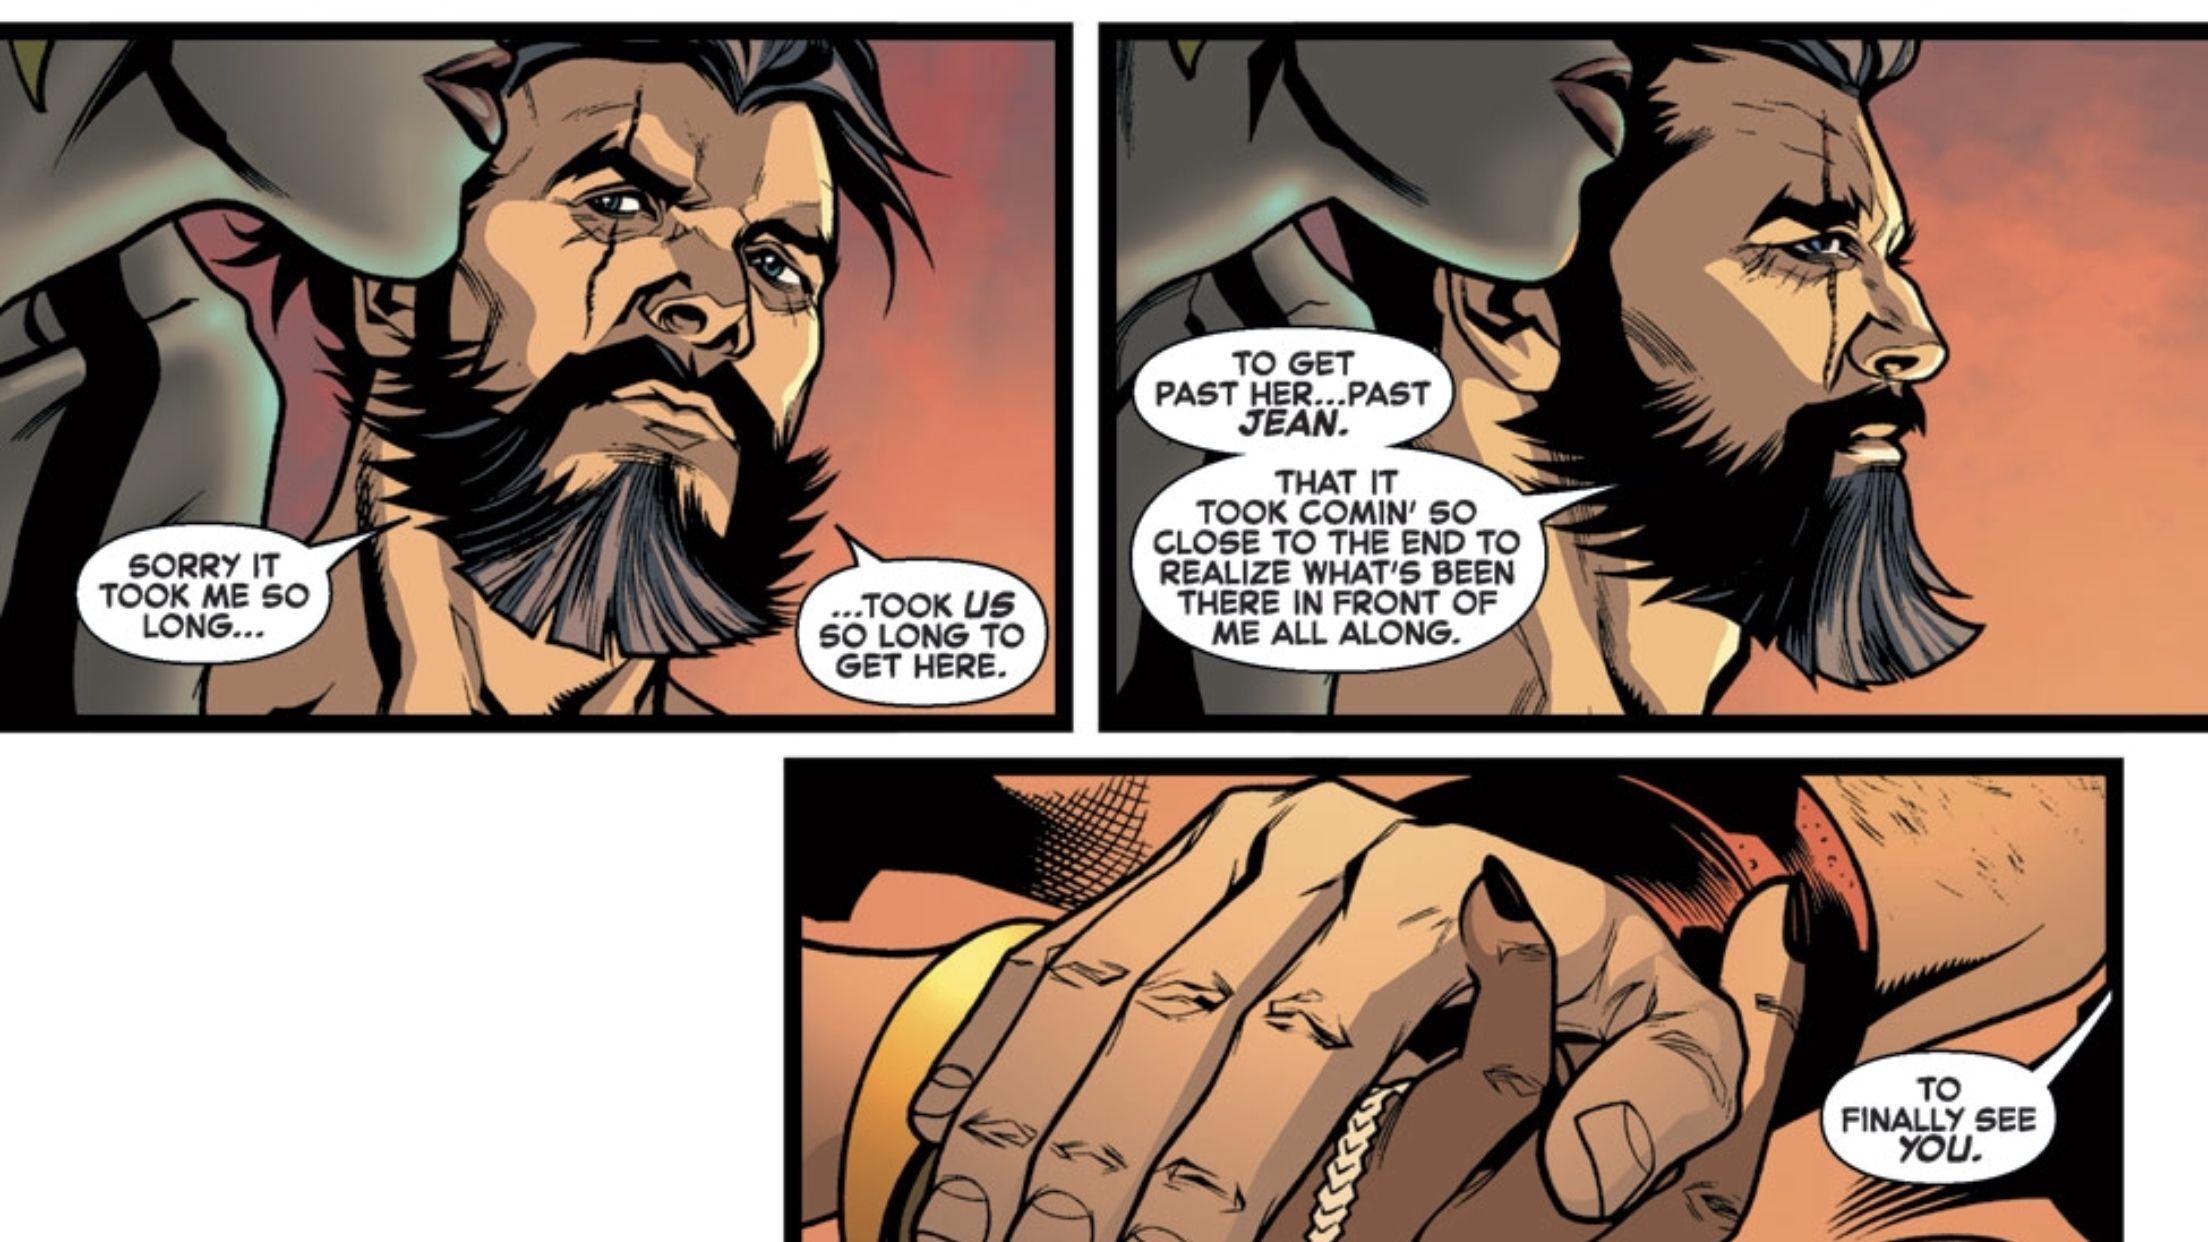 Relationship wolverine storm ROLO Wolverine